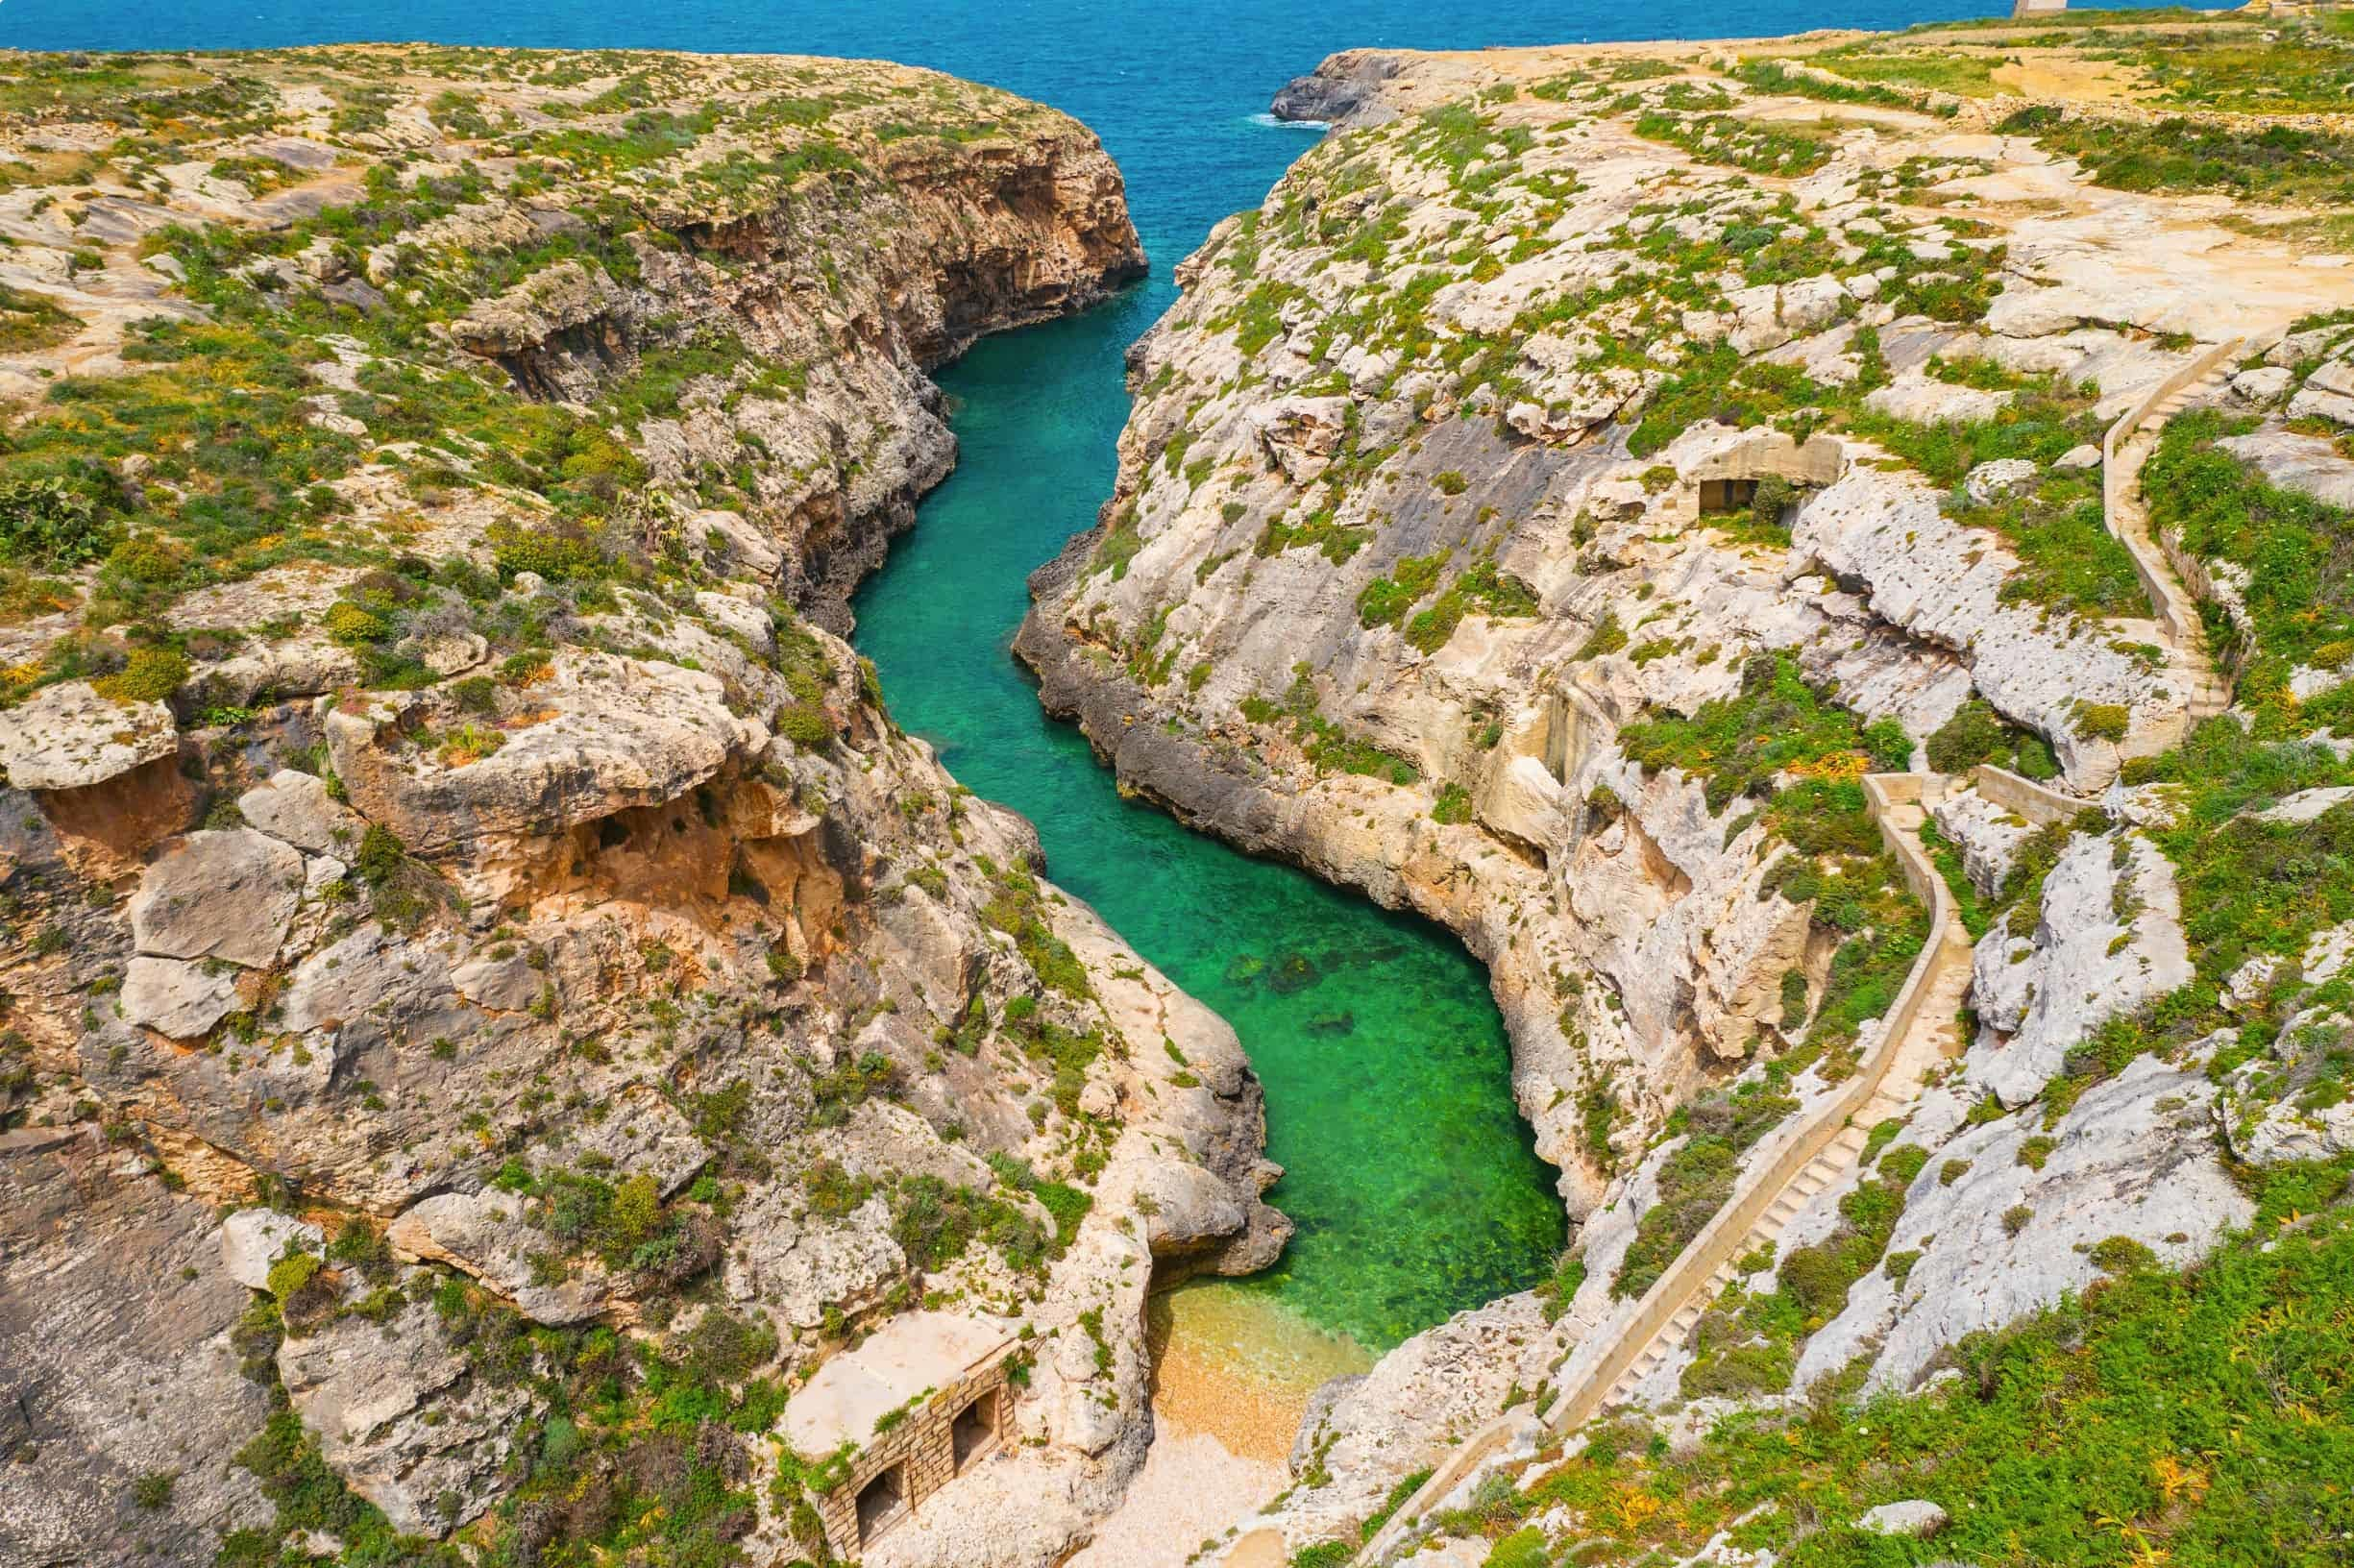 Gozo scenery